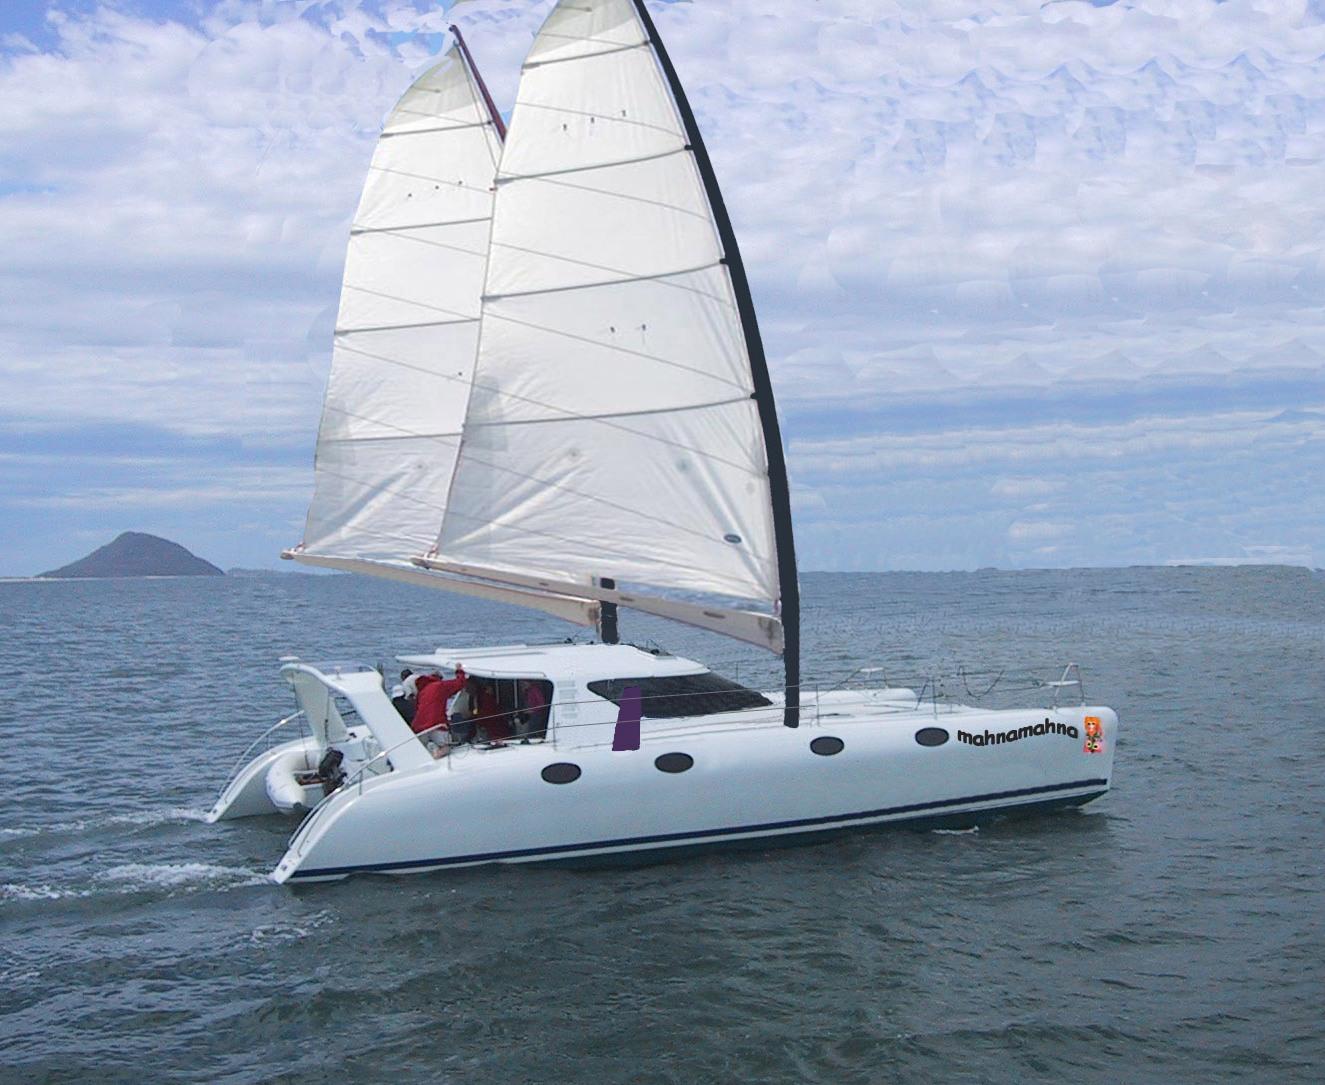 New Bi-Rig Performance Cruiser - Page 4 - Cruisers & Sailing